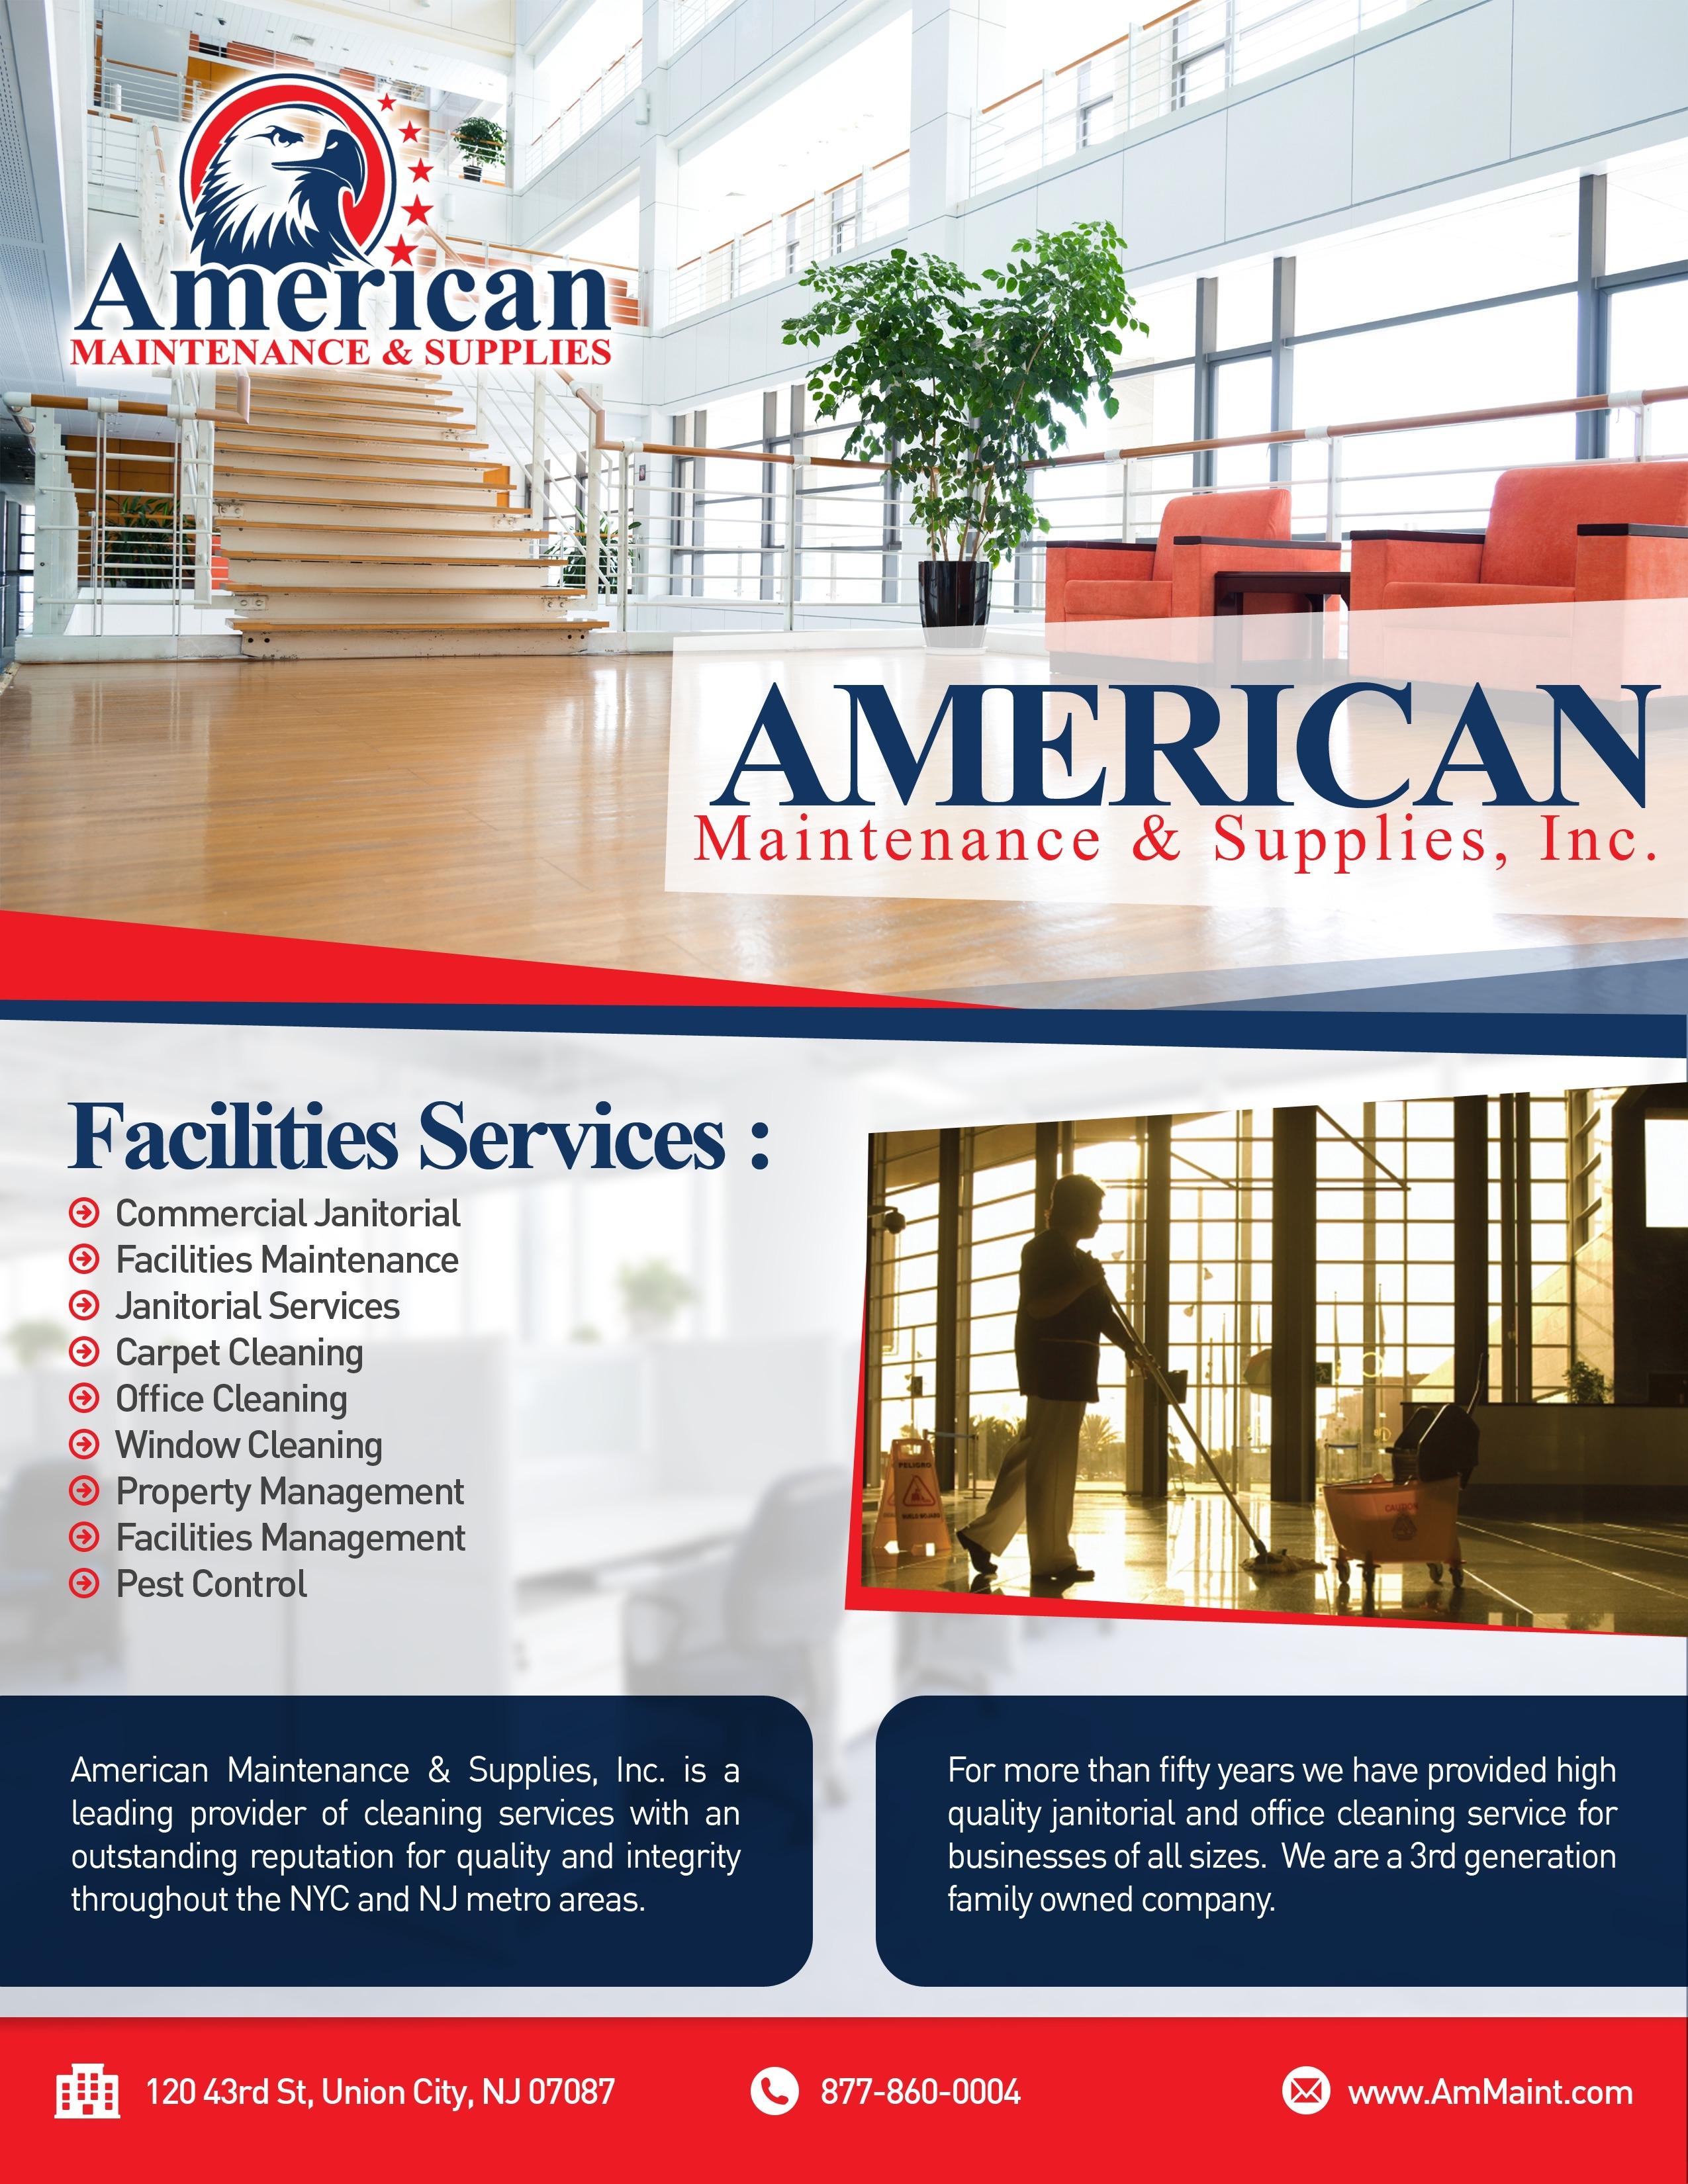 American Maintenance & Supplies, Inc. image 2